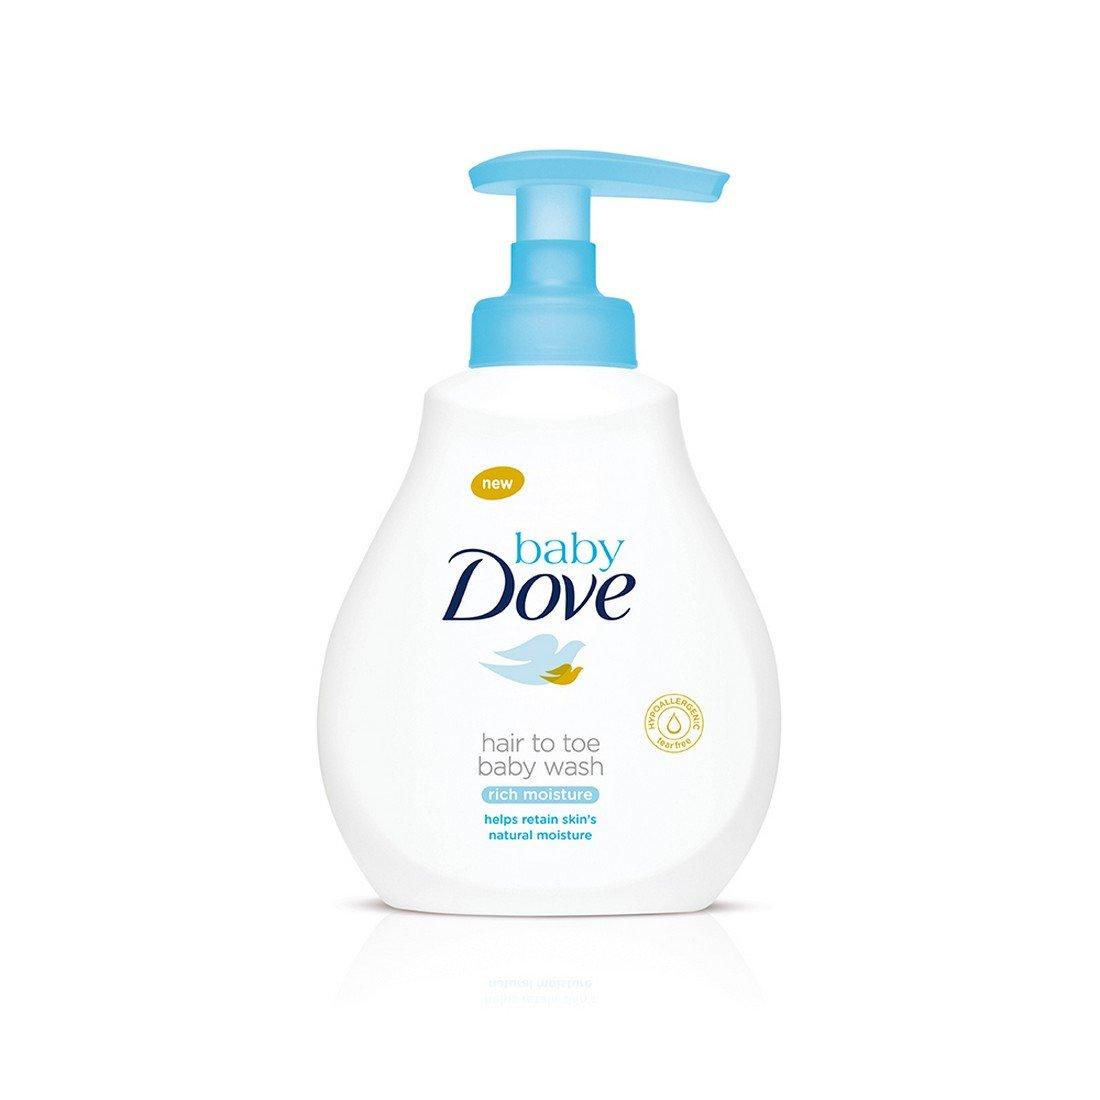 Baby Dove Rich Moisture Hair to Toe Baby Wash (400ml)